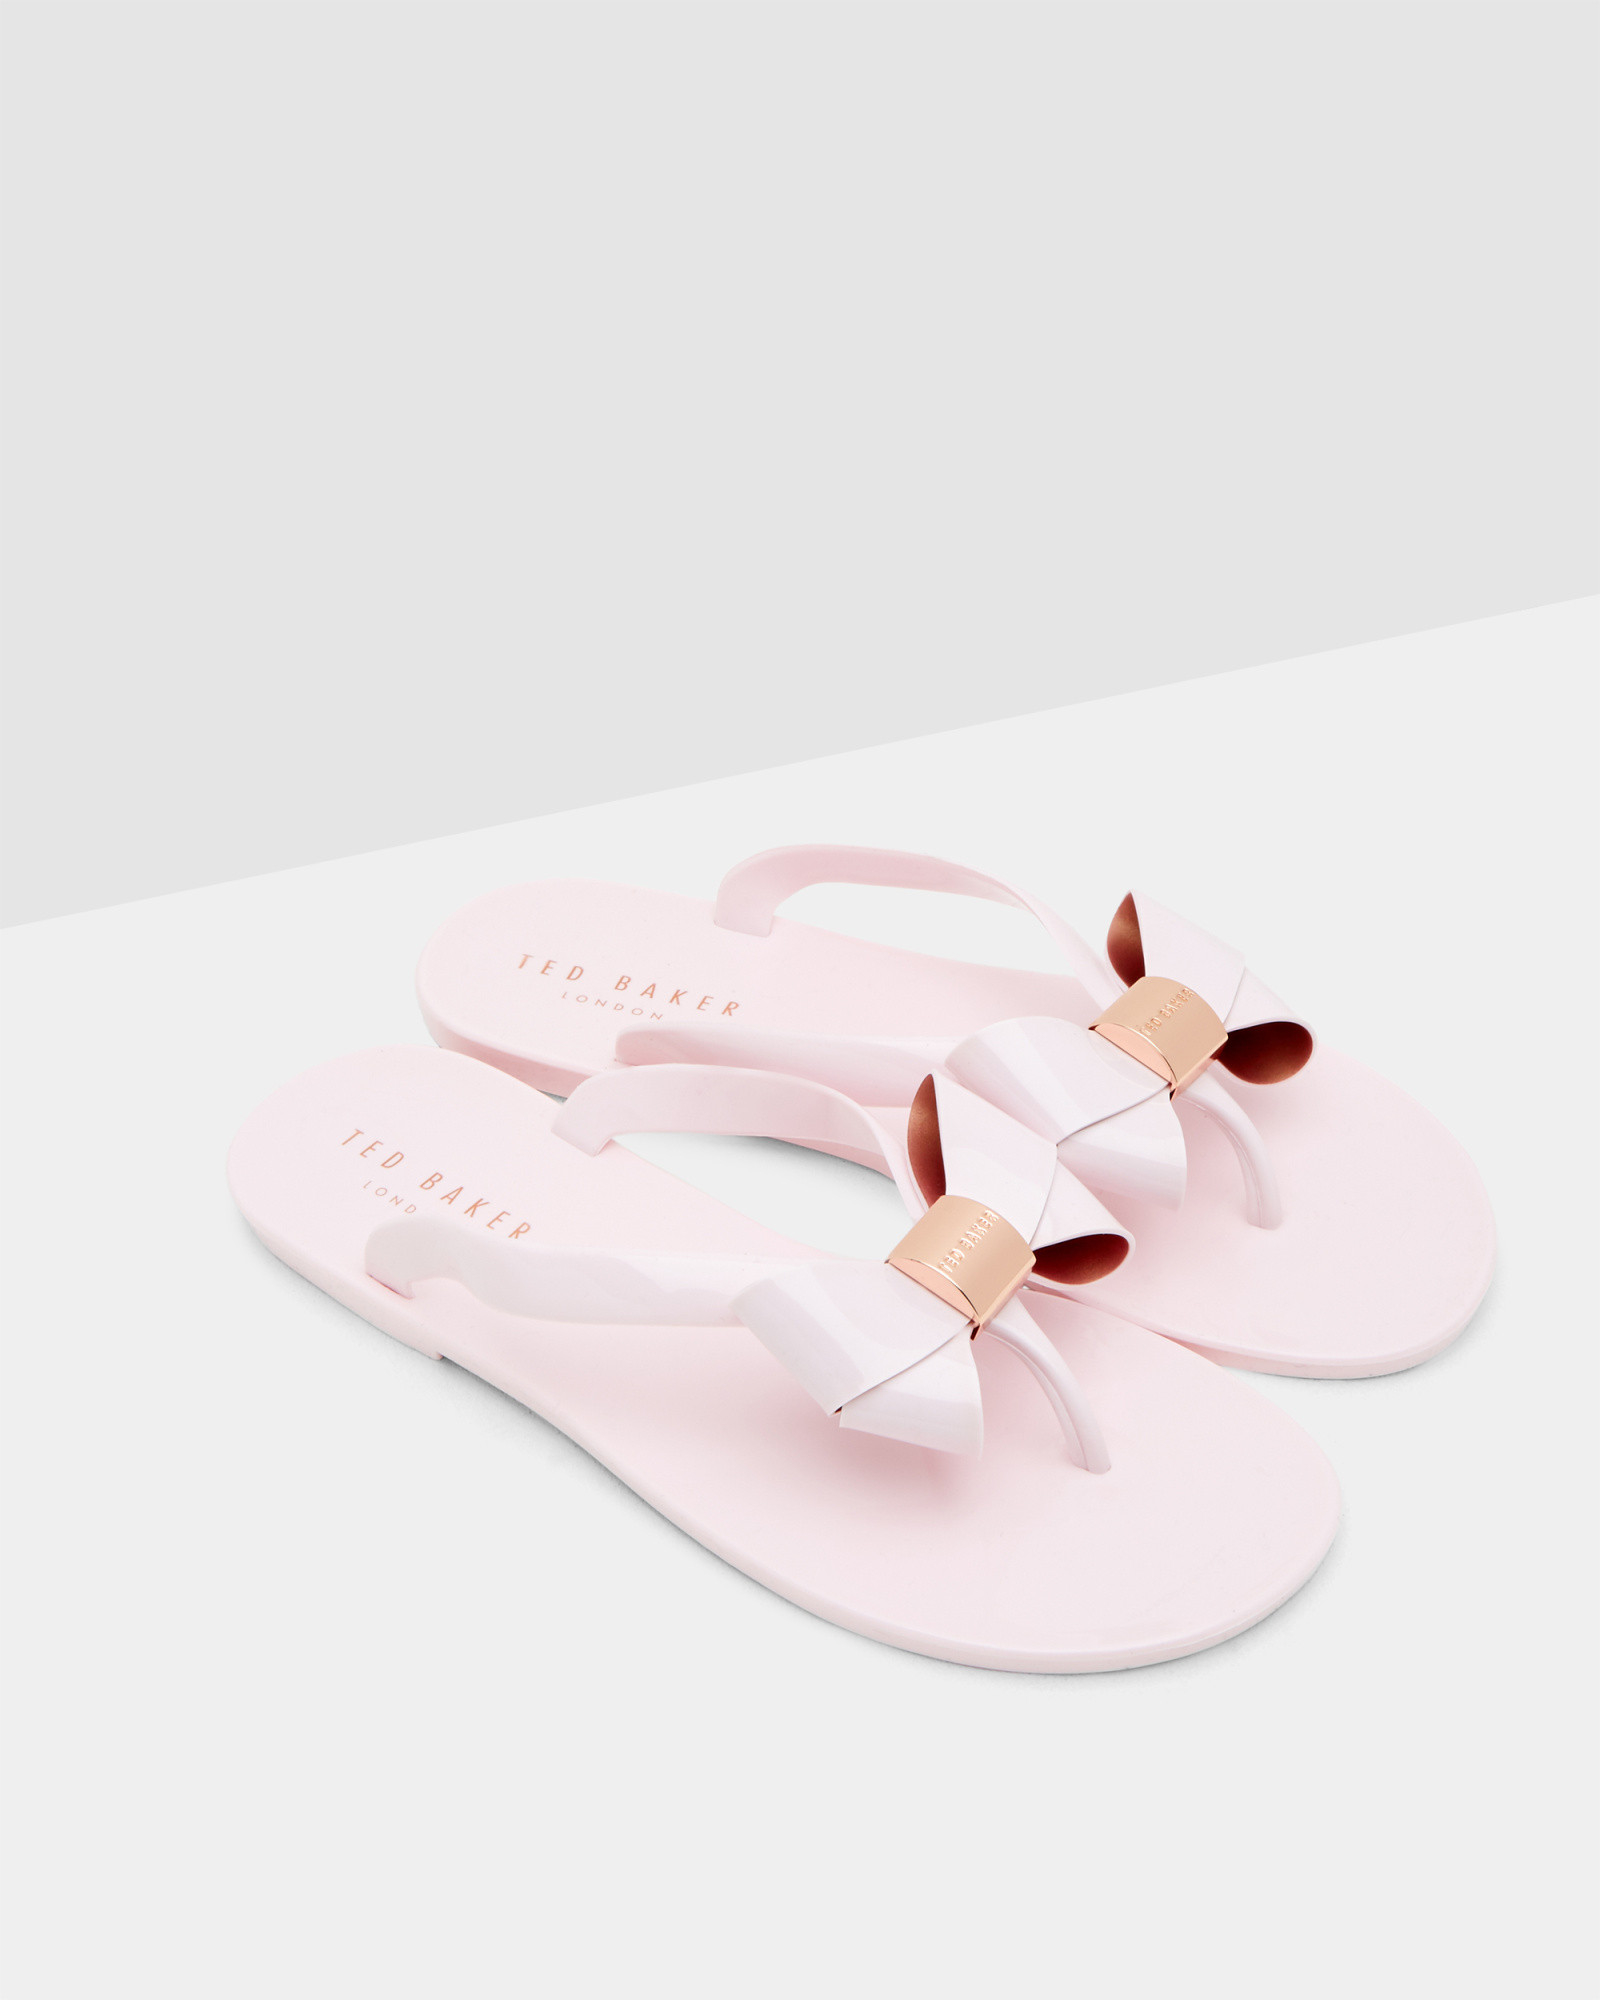 56d3970d0ec4 Ted Baker Bow Flip Flops in Pink - Lyst